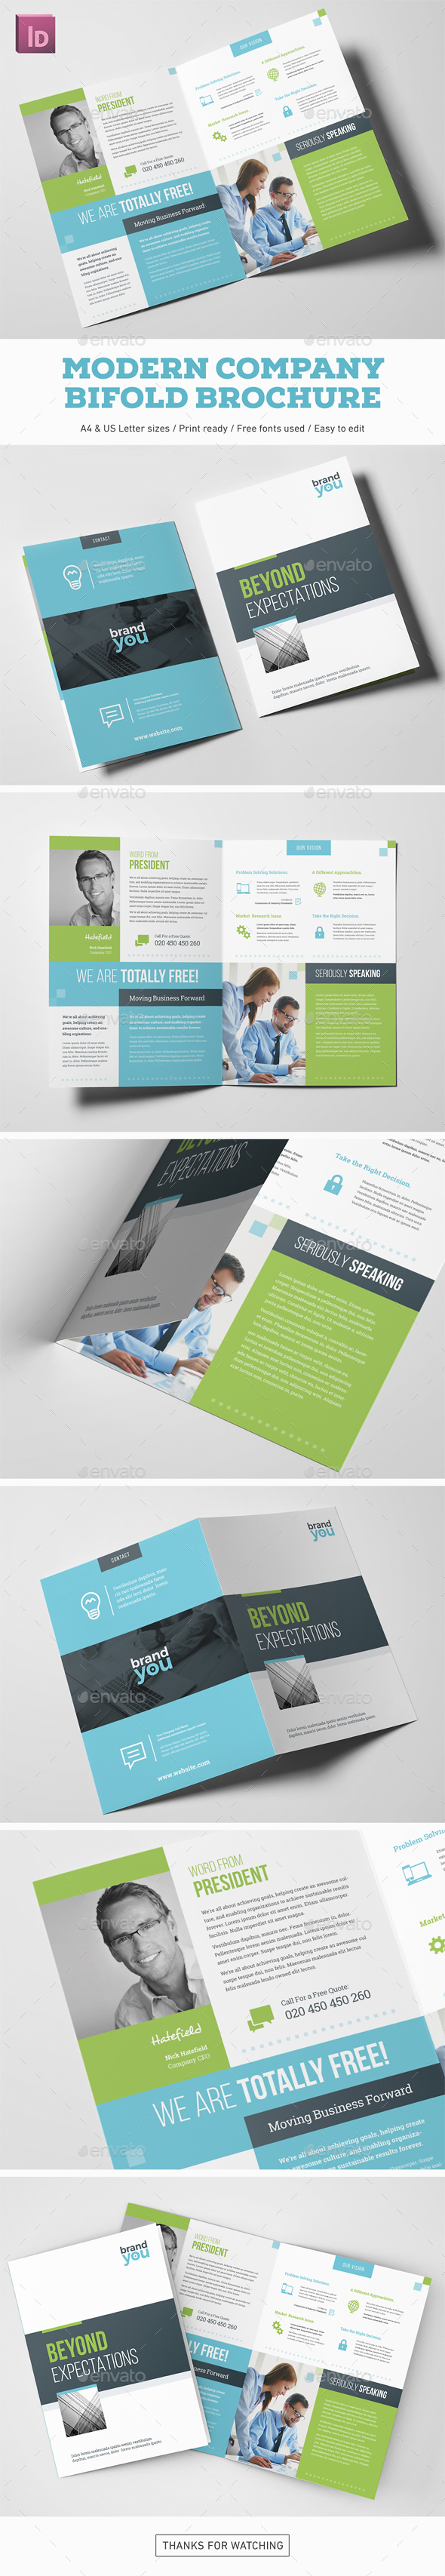 Modern Company Bifold Brochure - Corporate Brochures